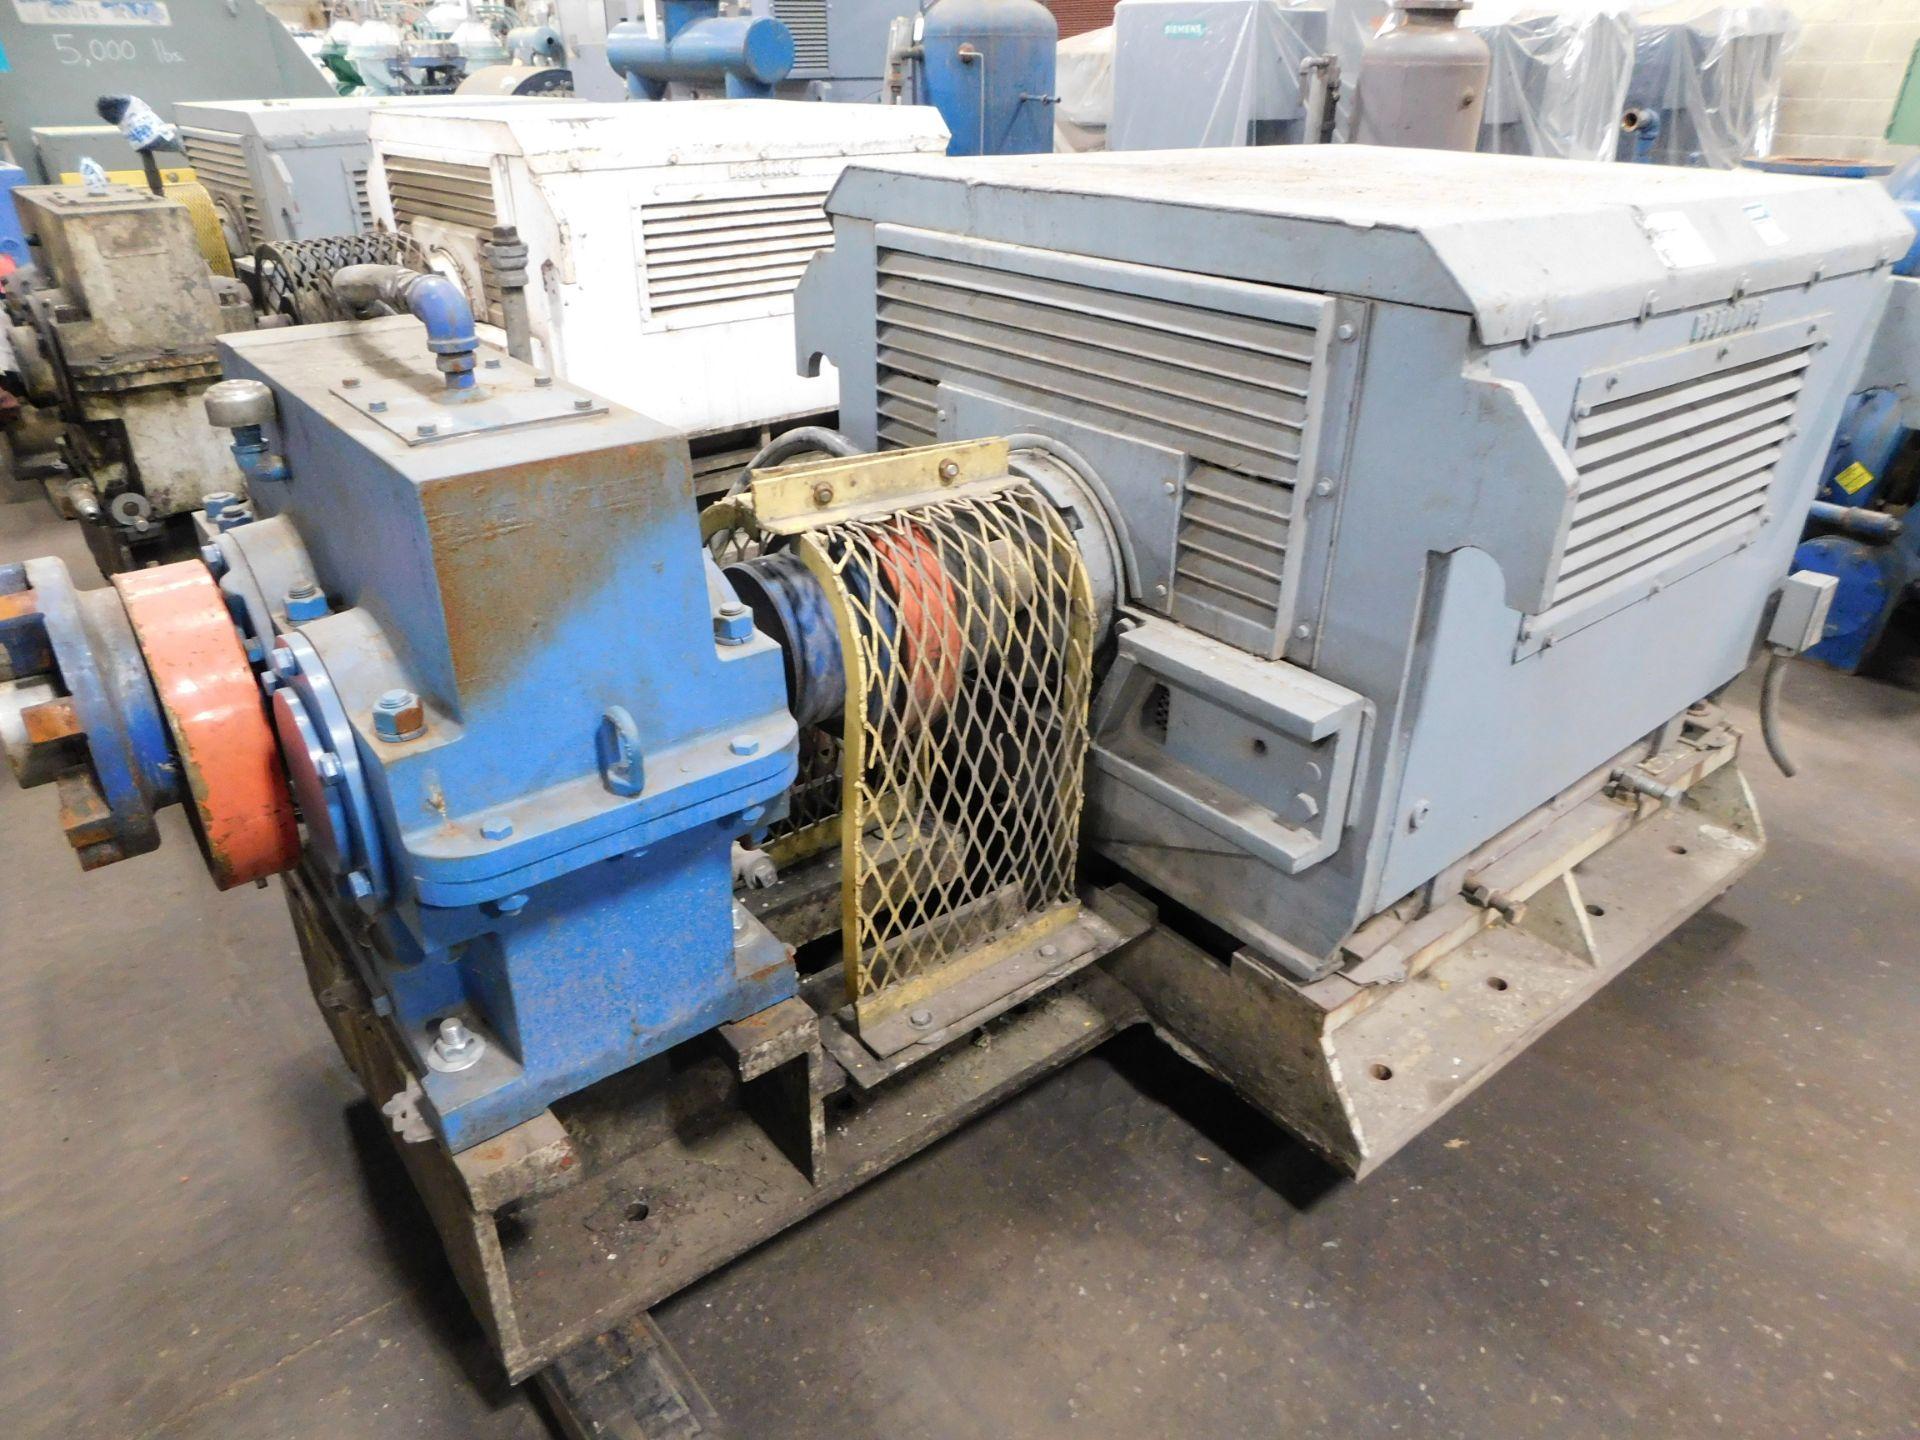 Reliance AC Duty Master Motor. 900 HP. 3 Ph. 60 Hz. 4160 V. 1789 RPM. 6809S. Type P. - Image 2 of 10